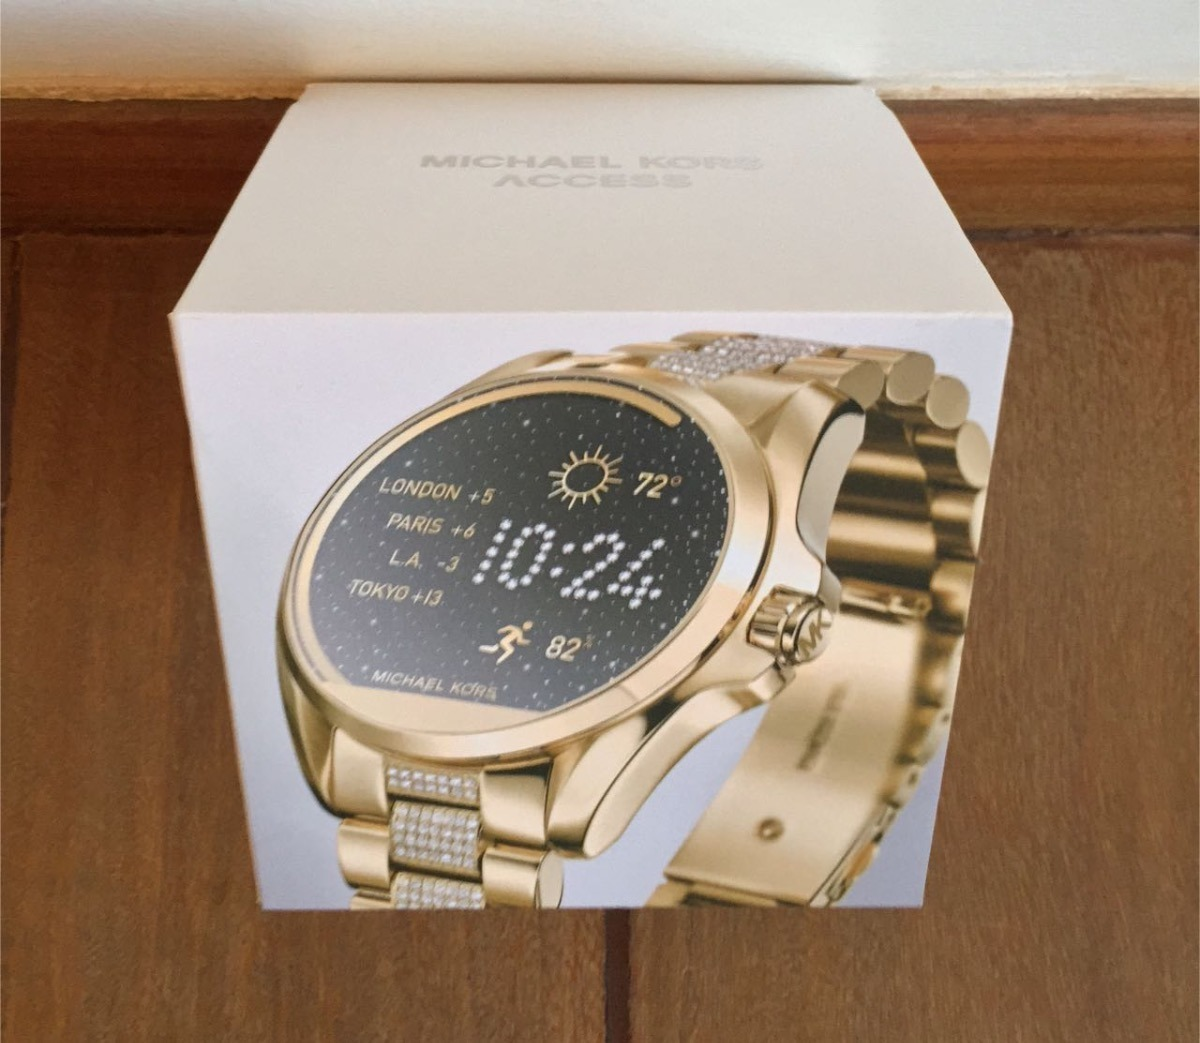 a220b26641938 Relogio Michael Kors Mkt5002 Access Smartwatch Swarovski - R  1.490 ...